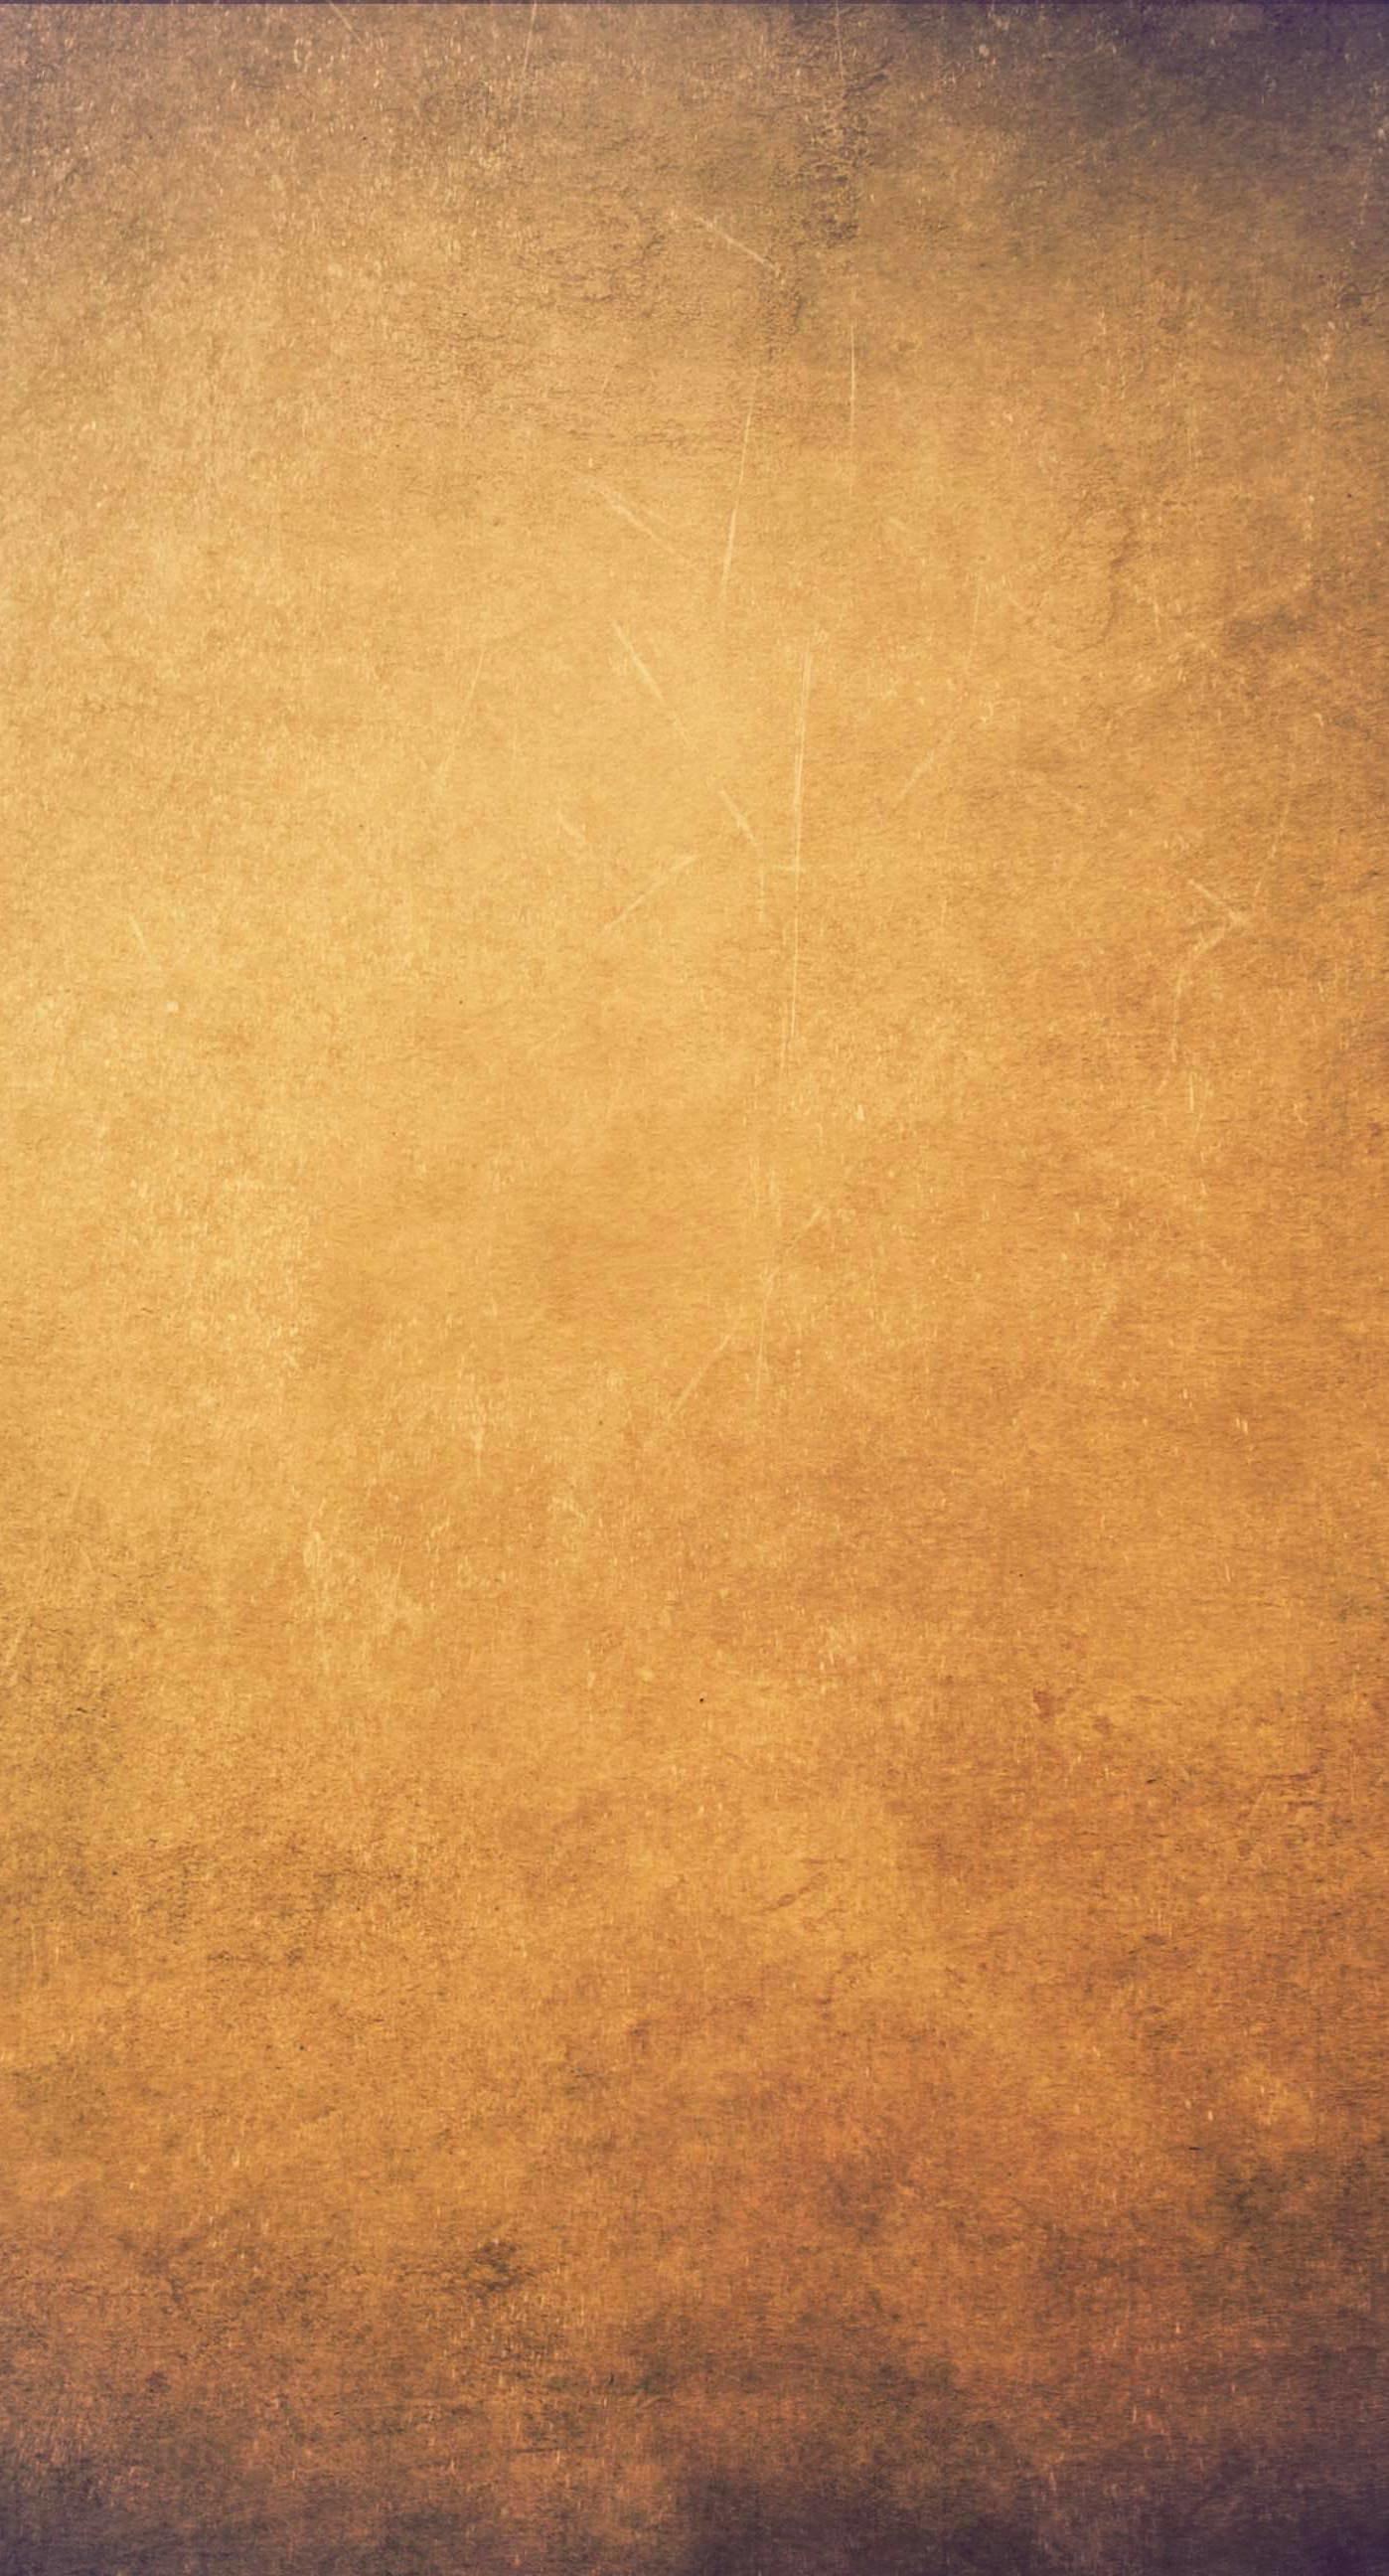 Pattern black gold | wallpaper.sc iPhone6Plus